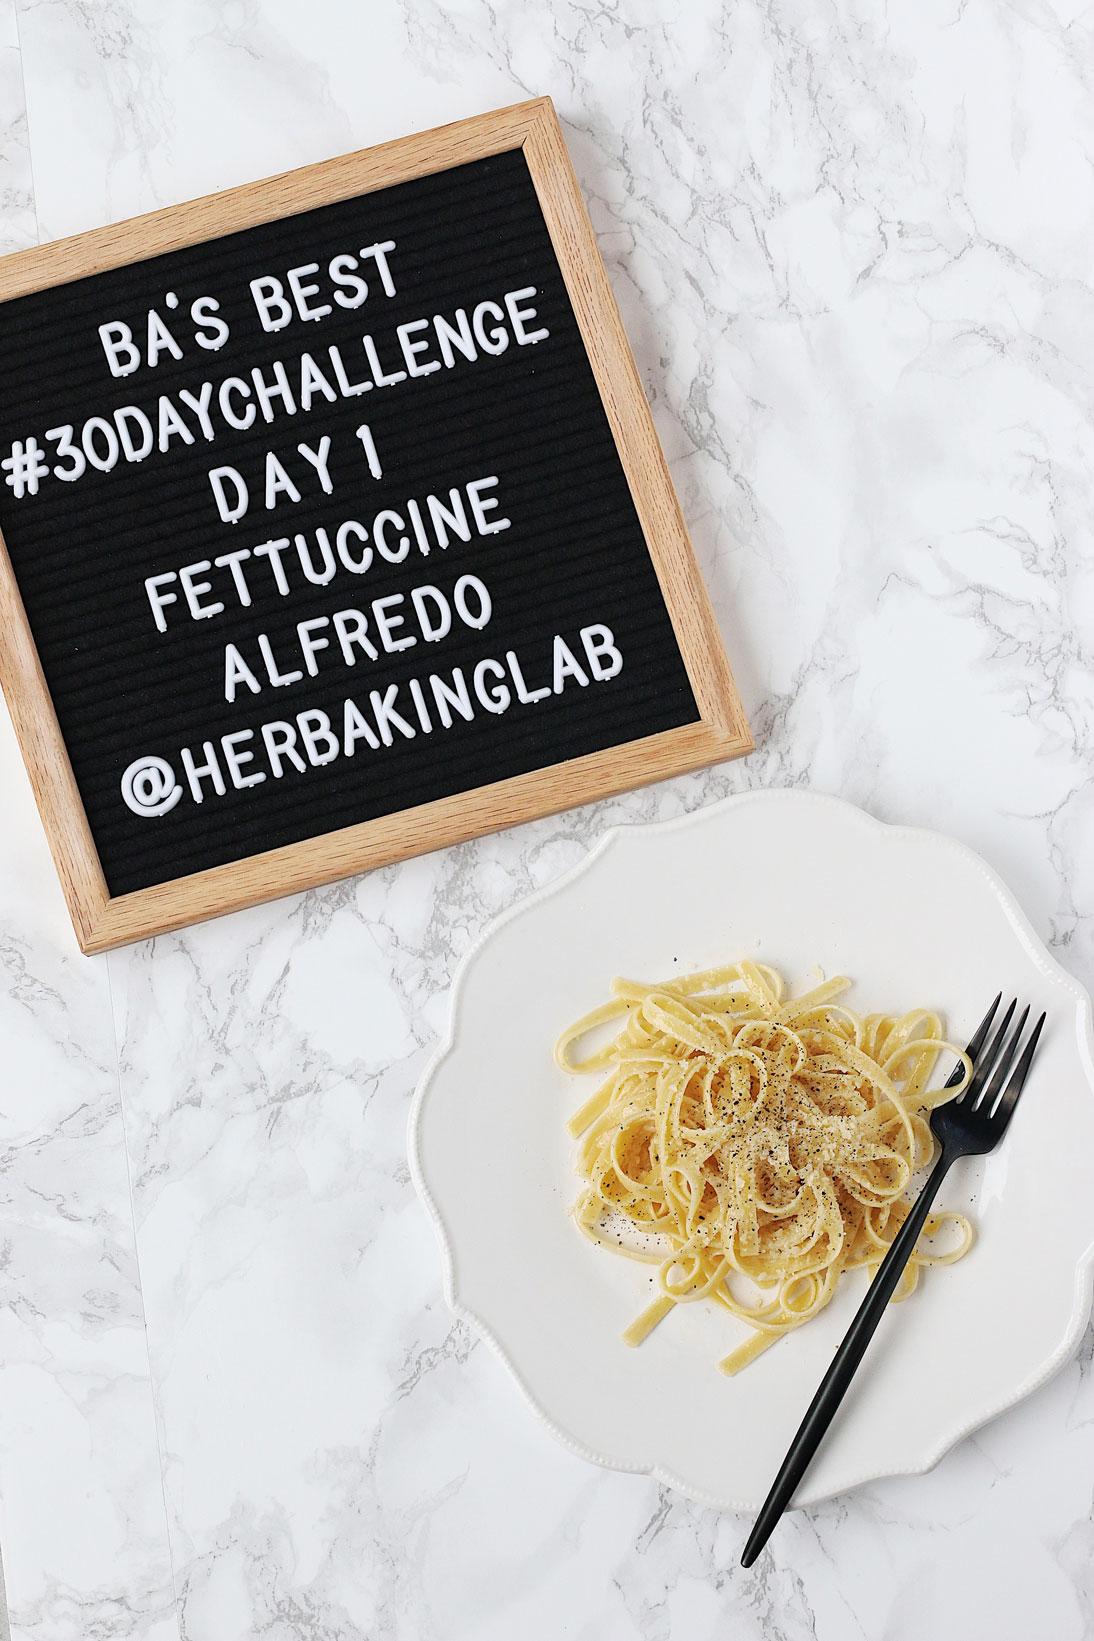 #ba30daychallenge-bon-appetit-best-recipes-day-1-fetticcone-alfredo